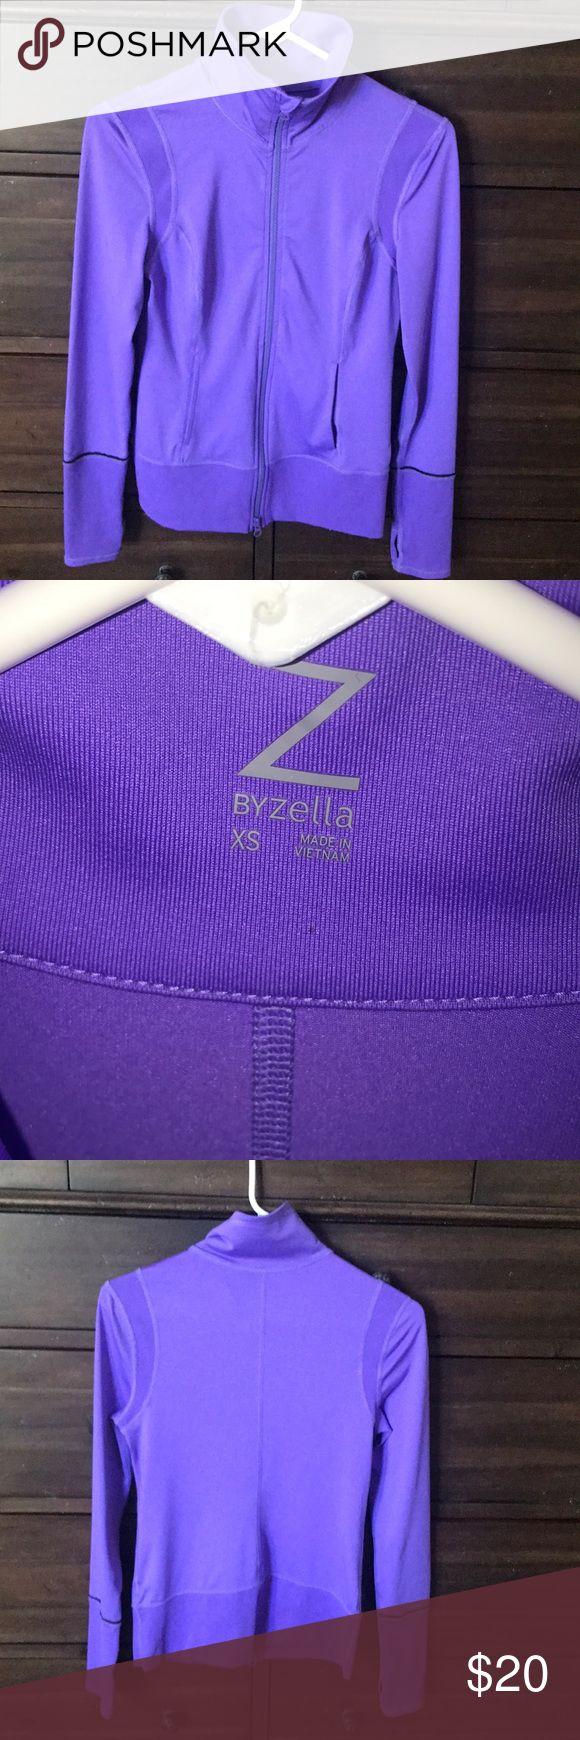 Zella purple zip up Zella size extra small purple workout jacket full zip pockets Zella Jackets & Coats